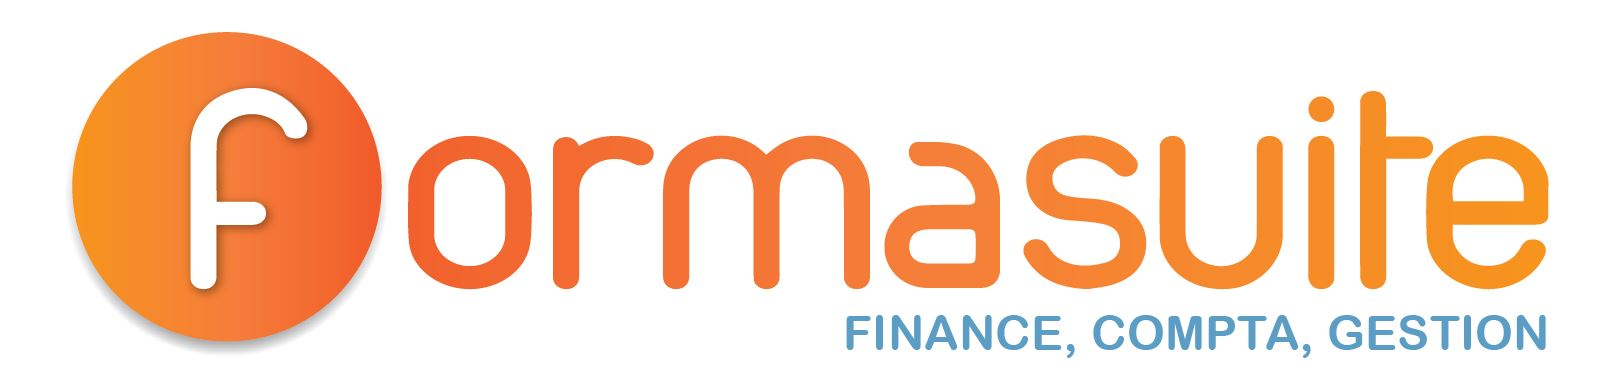 FORMASUITE - Finance, Compta, Gestion